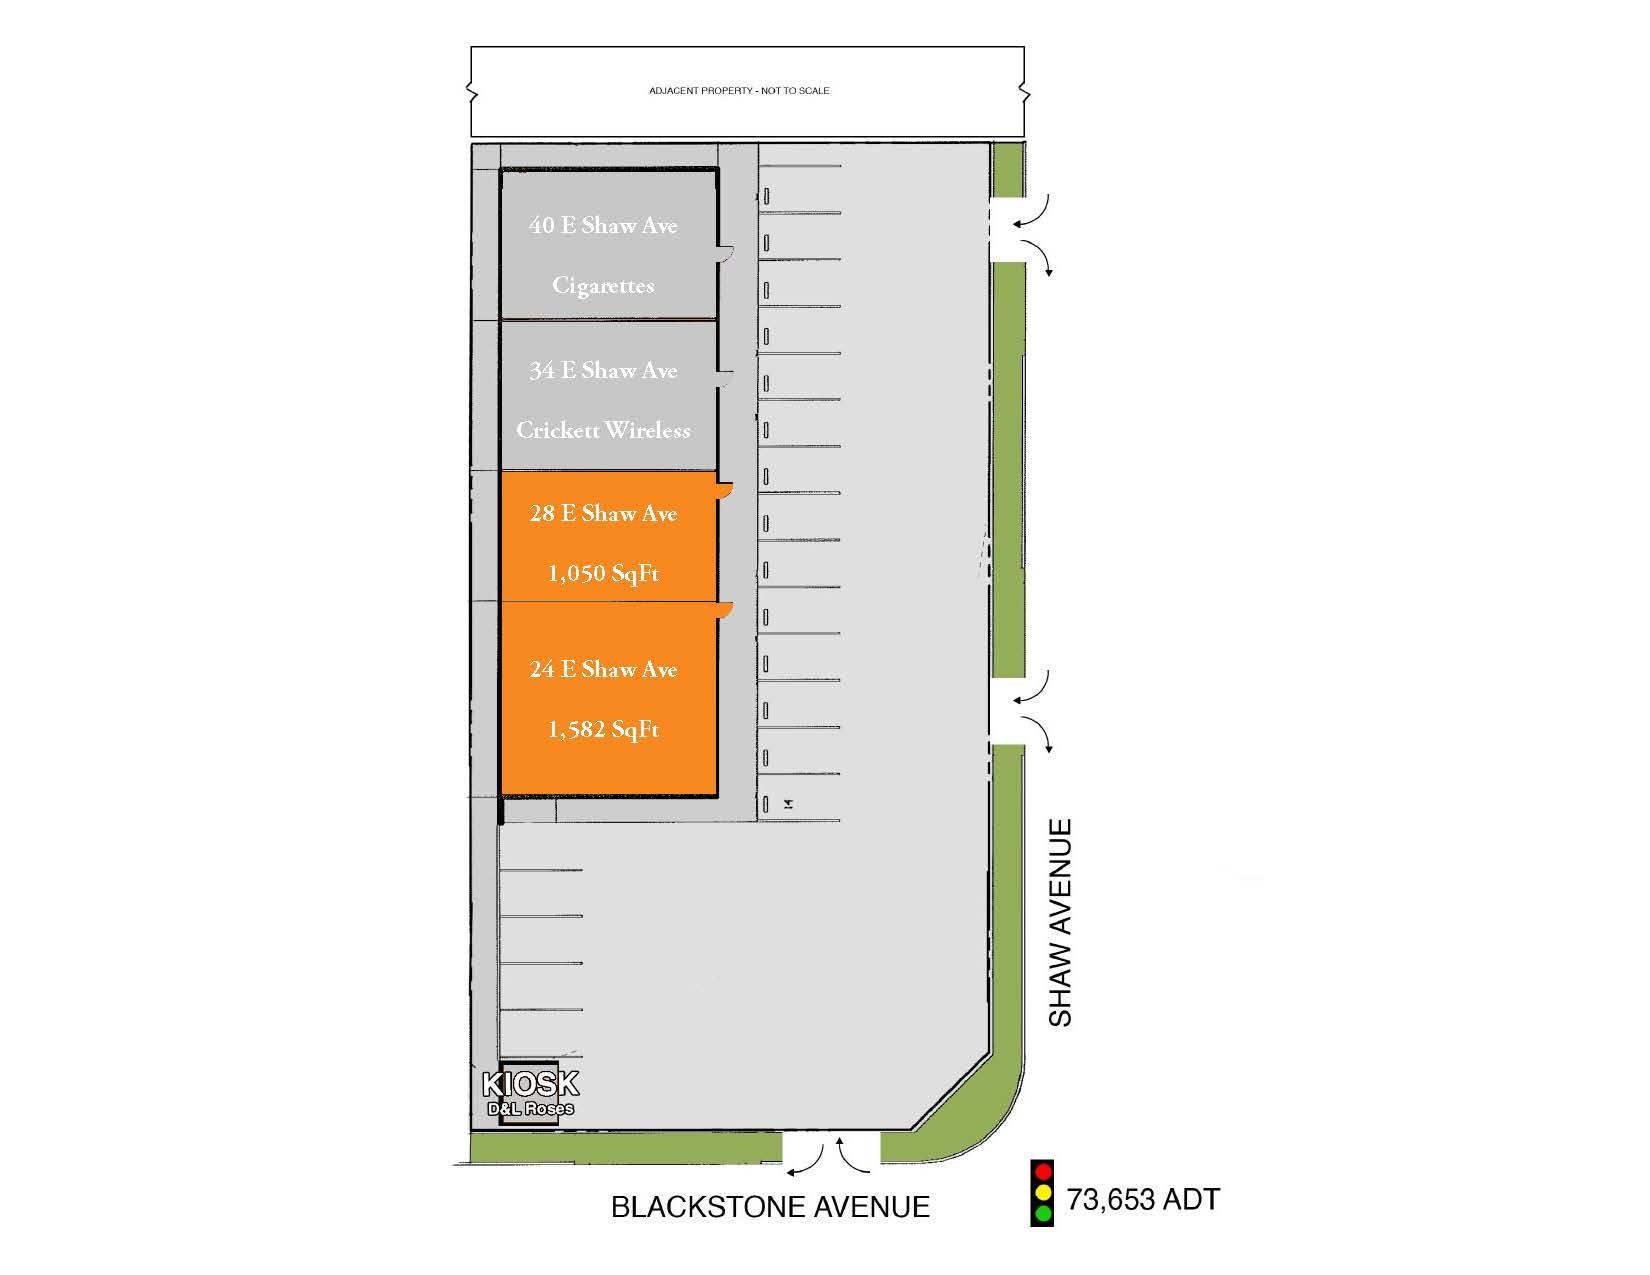 landmark-siteplan-2-17-16